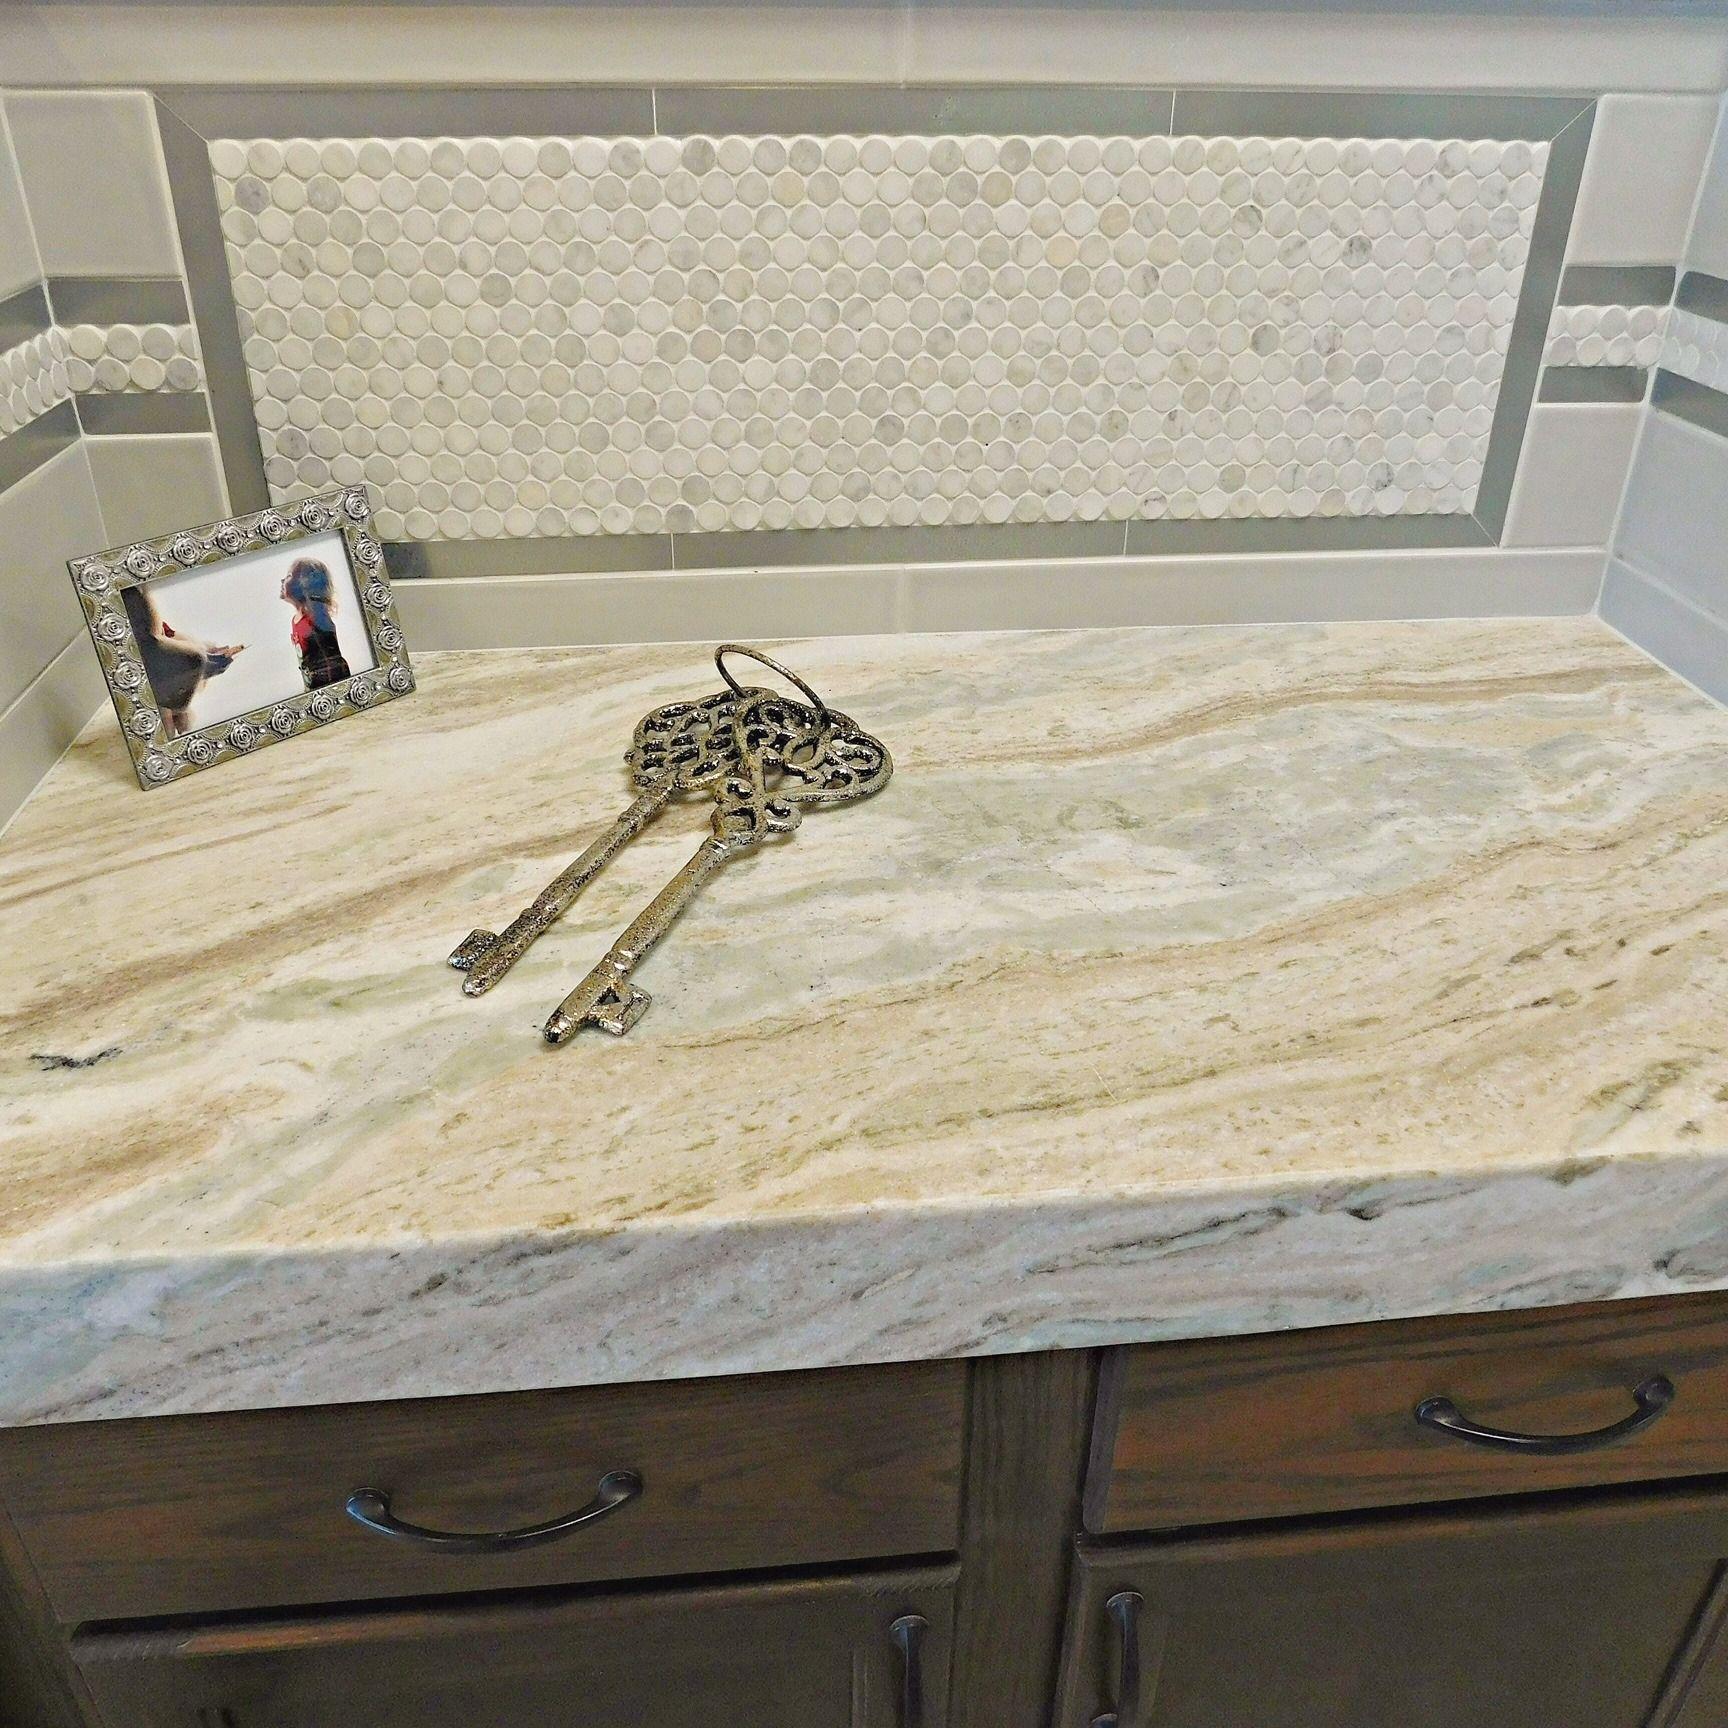 Kitchen Backsplash Ideas A Splattering Of The Most: Pin By RM Tech Korea (StoneTools Korea®) On Granite